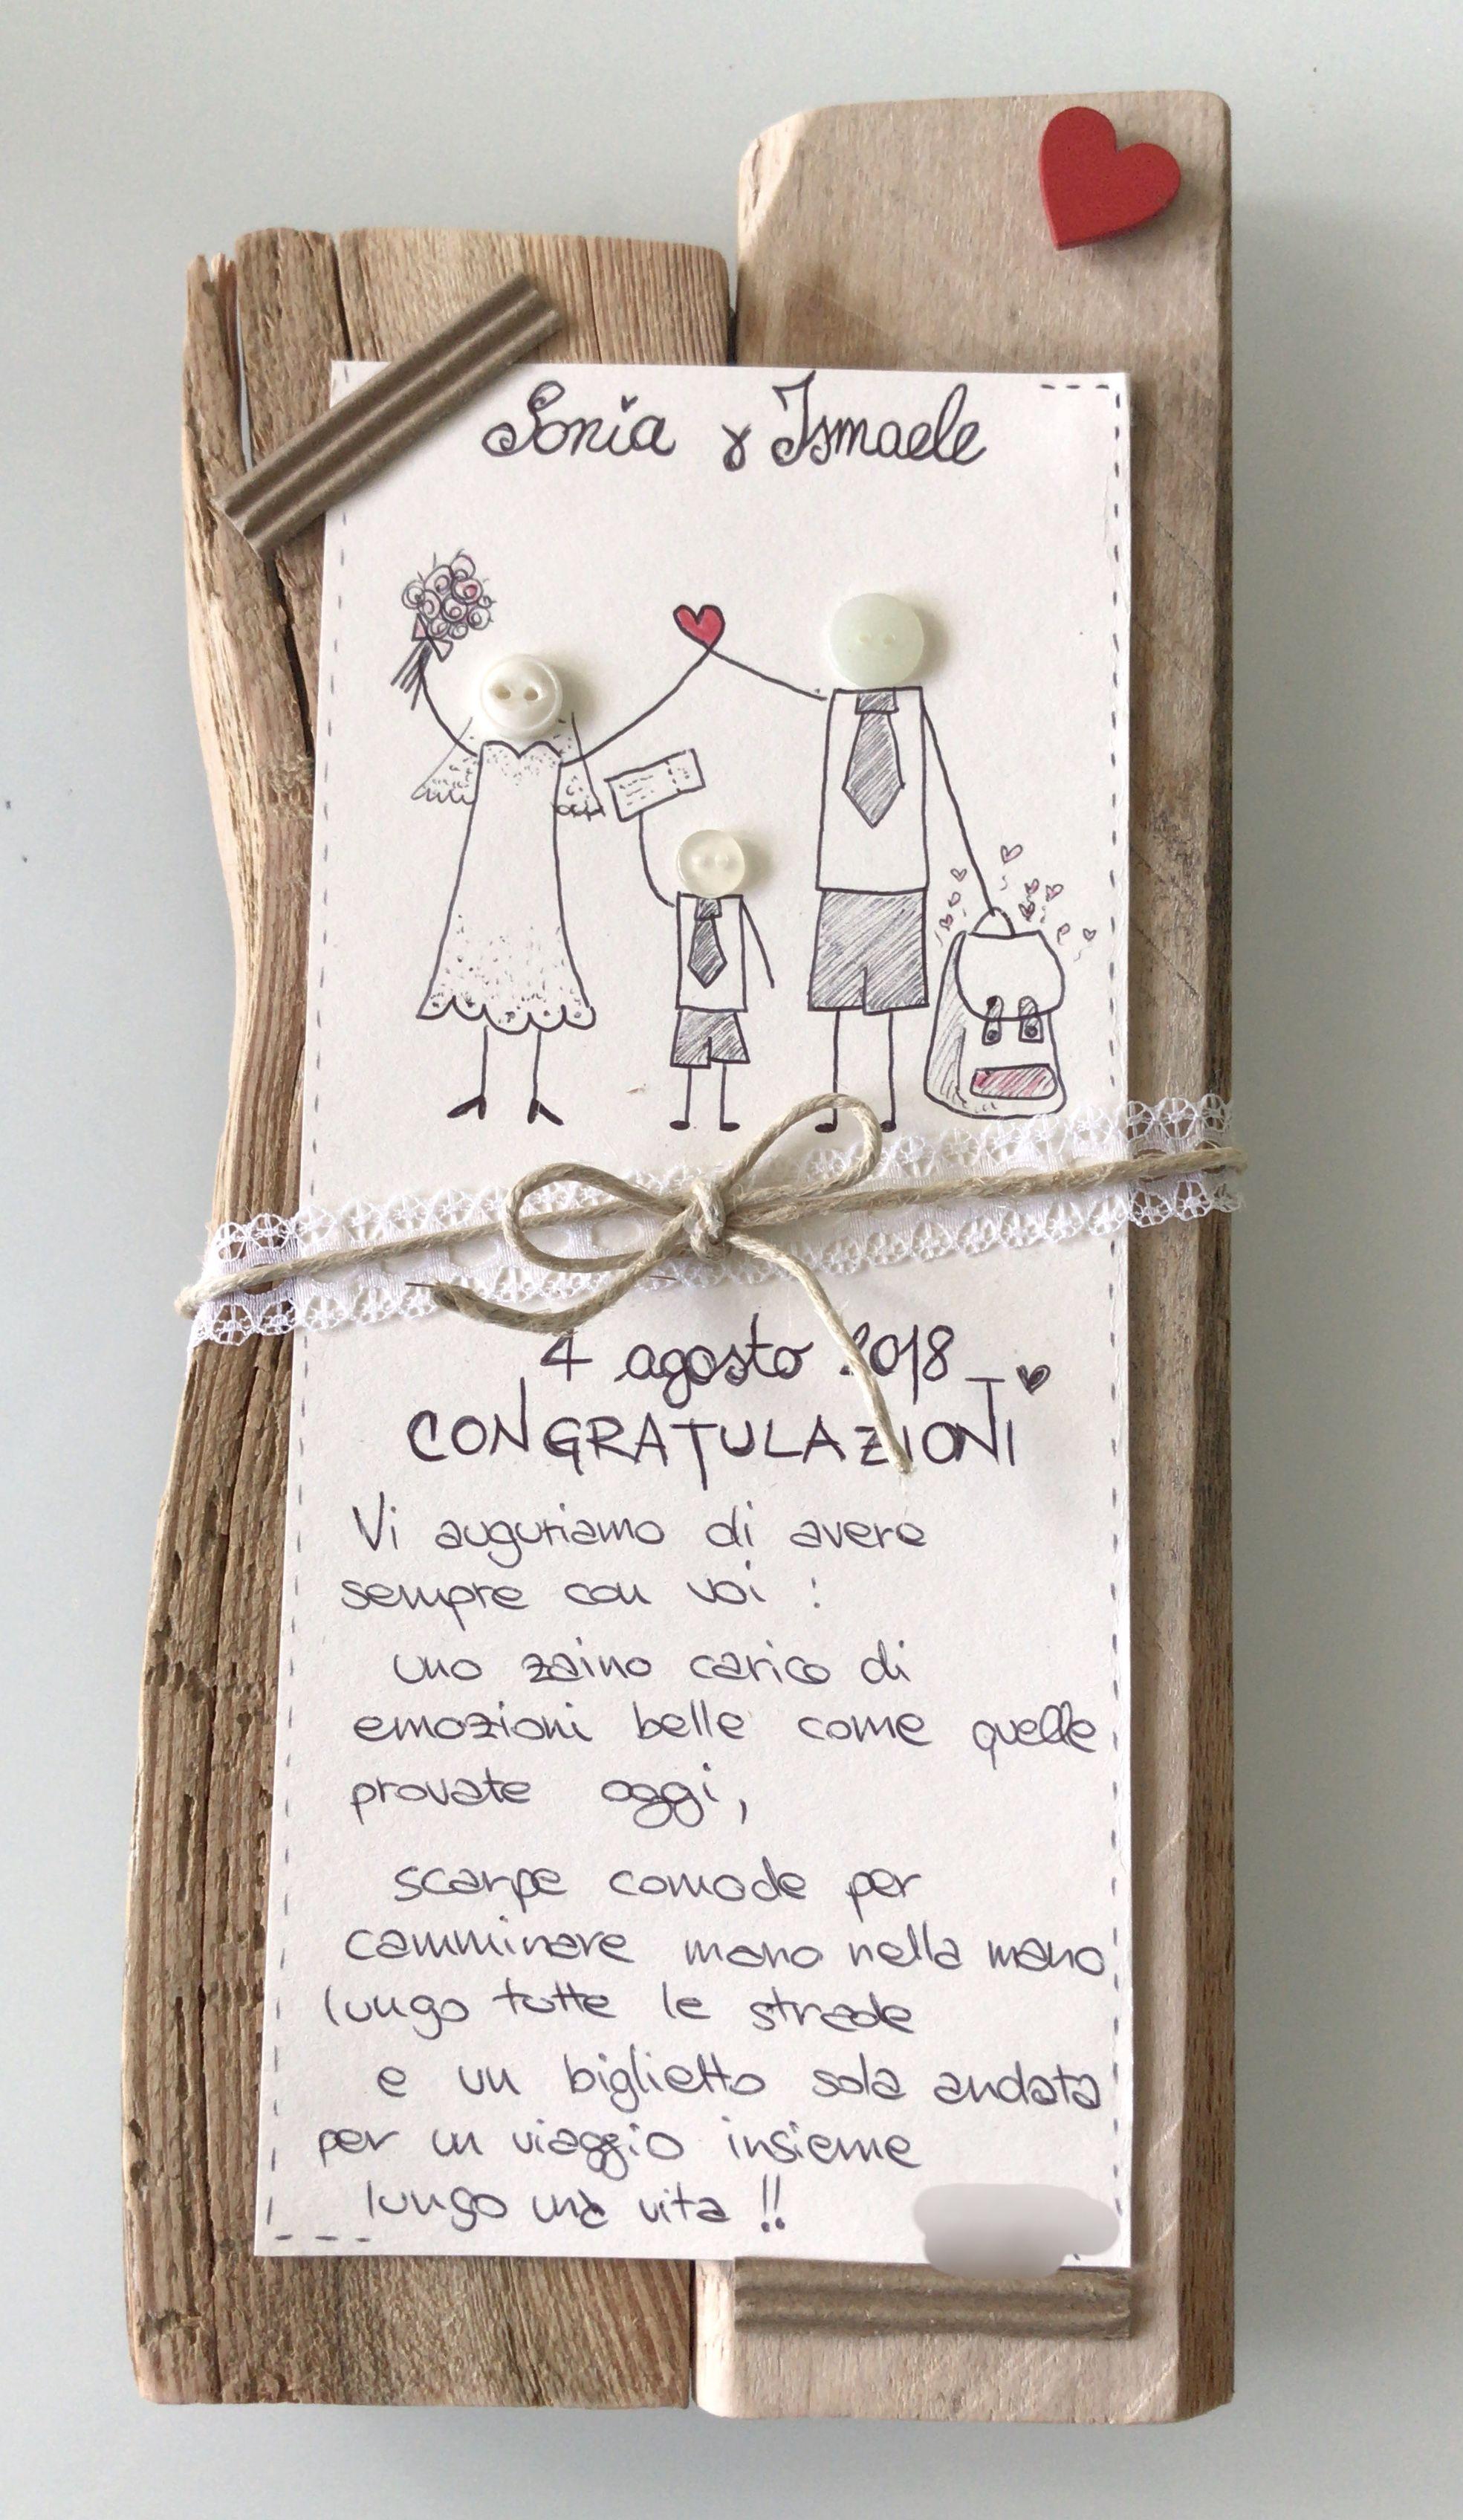 Idea Auguri Sposi Fai Da Te Frasi Per Matrimoni Biglietti Auguri Fai Da Te Comunione Biglietti Matrimonio Fai Da Te